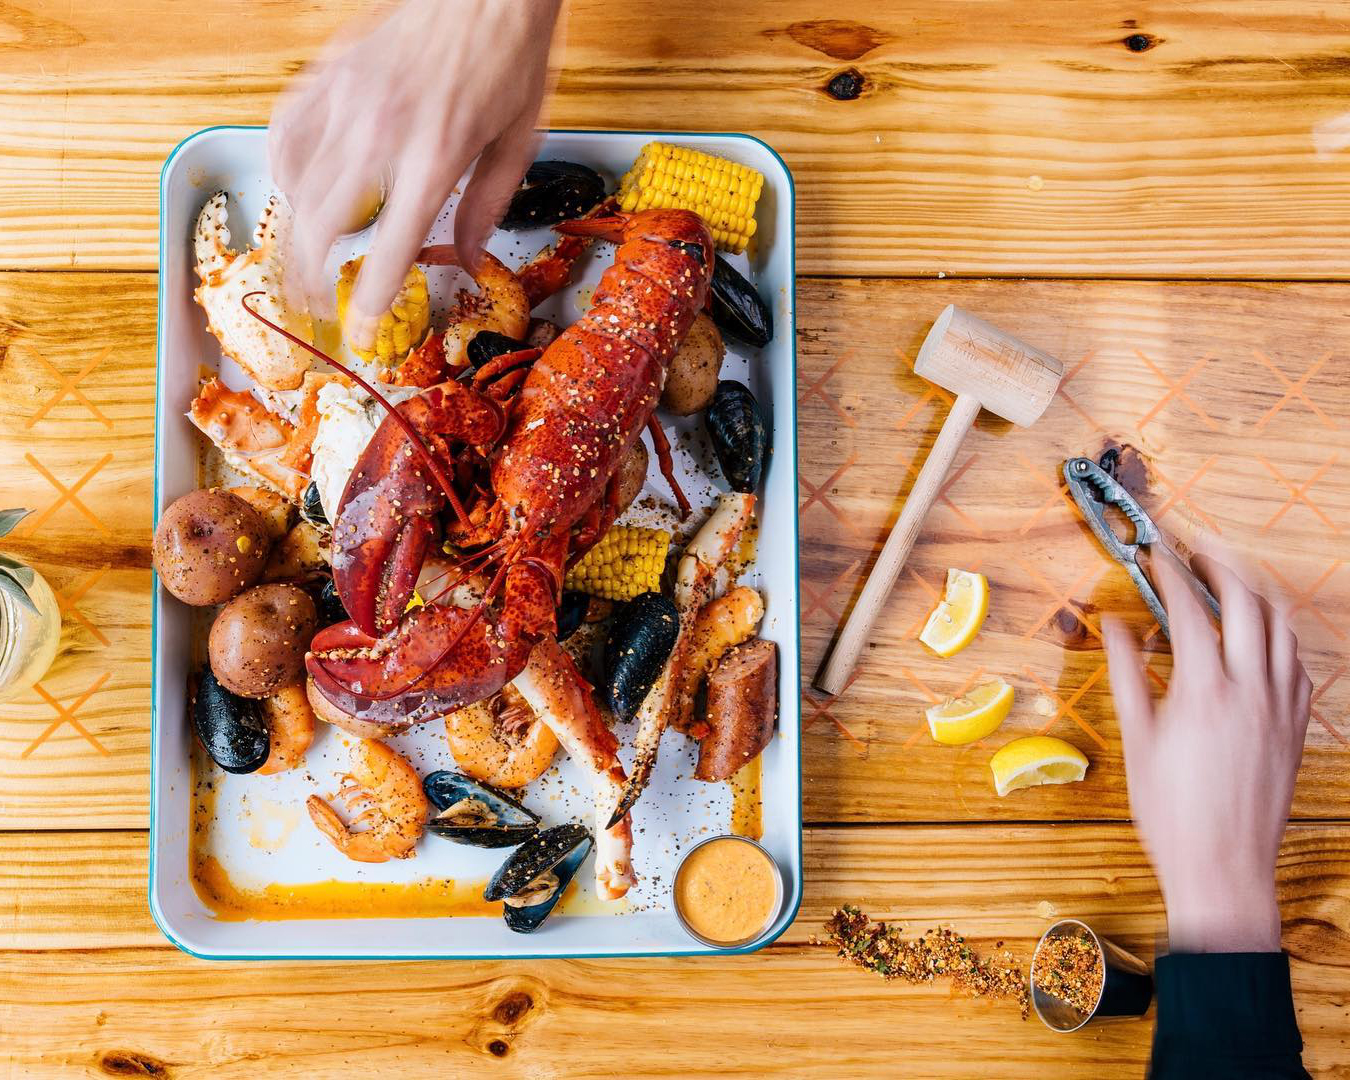 TLC's lobster boil